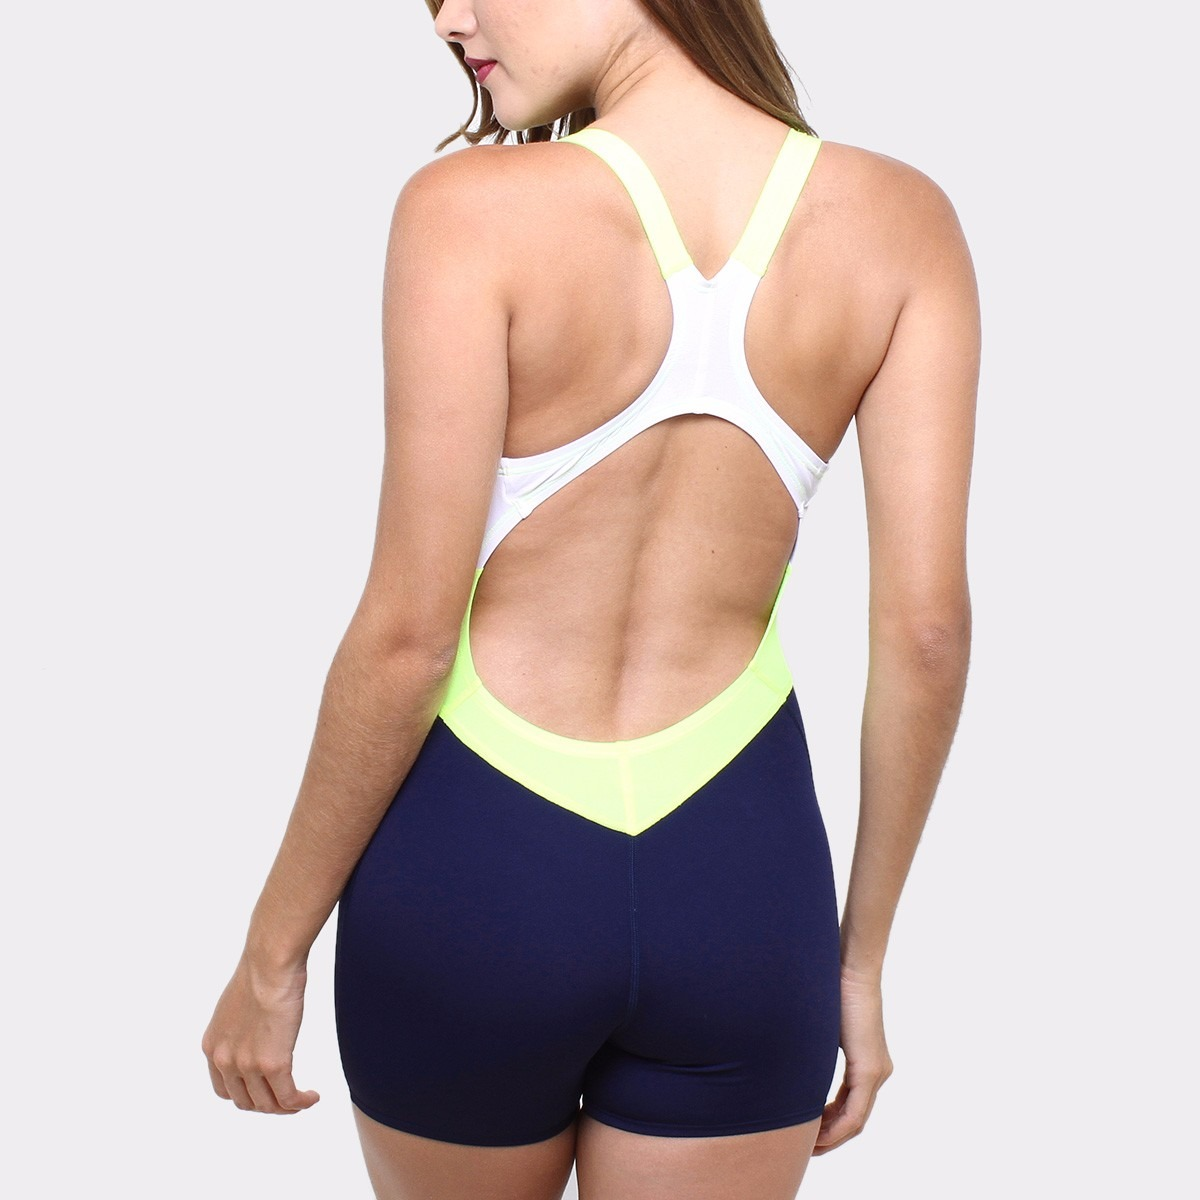 0bbedb133450 Traje De Baño Nike Short Bloque Natacion Color Marino/lima